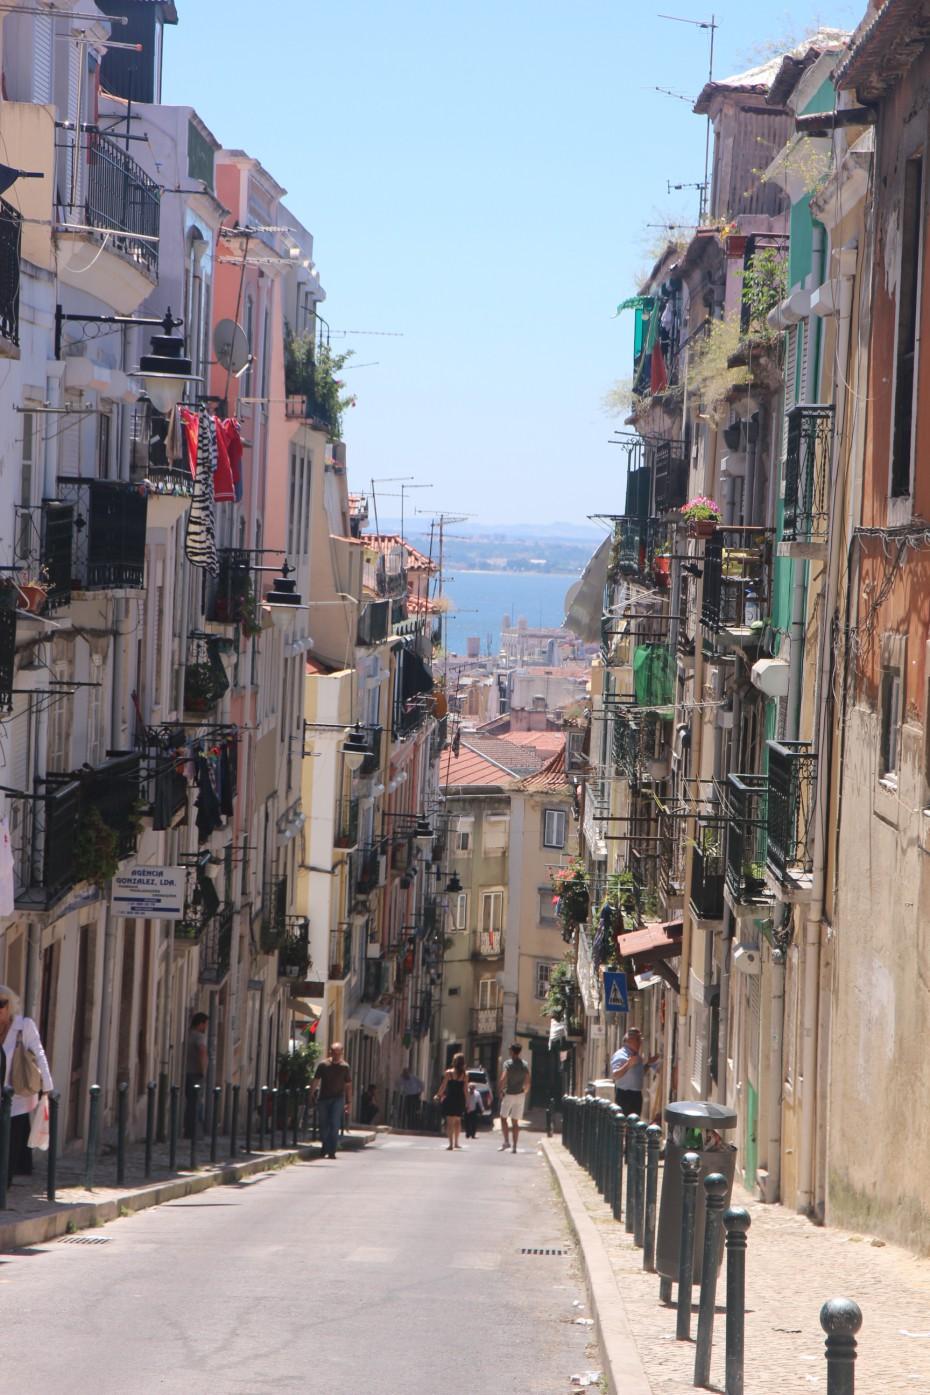 Pena neighbourhood, Rossio, Lisbon